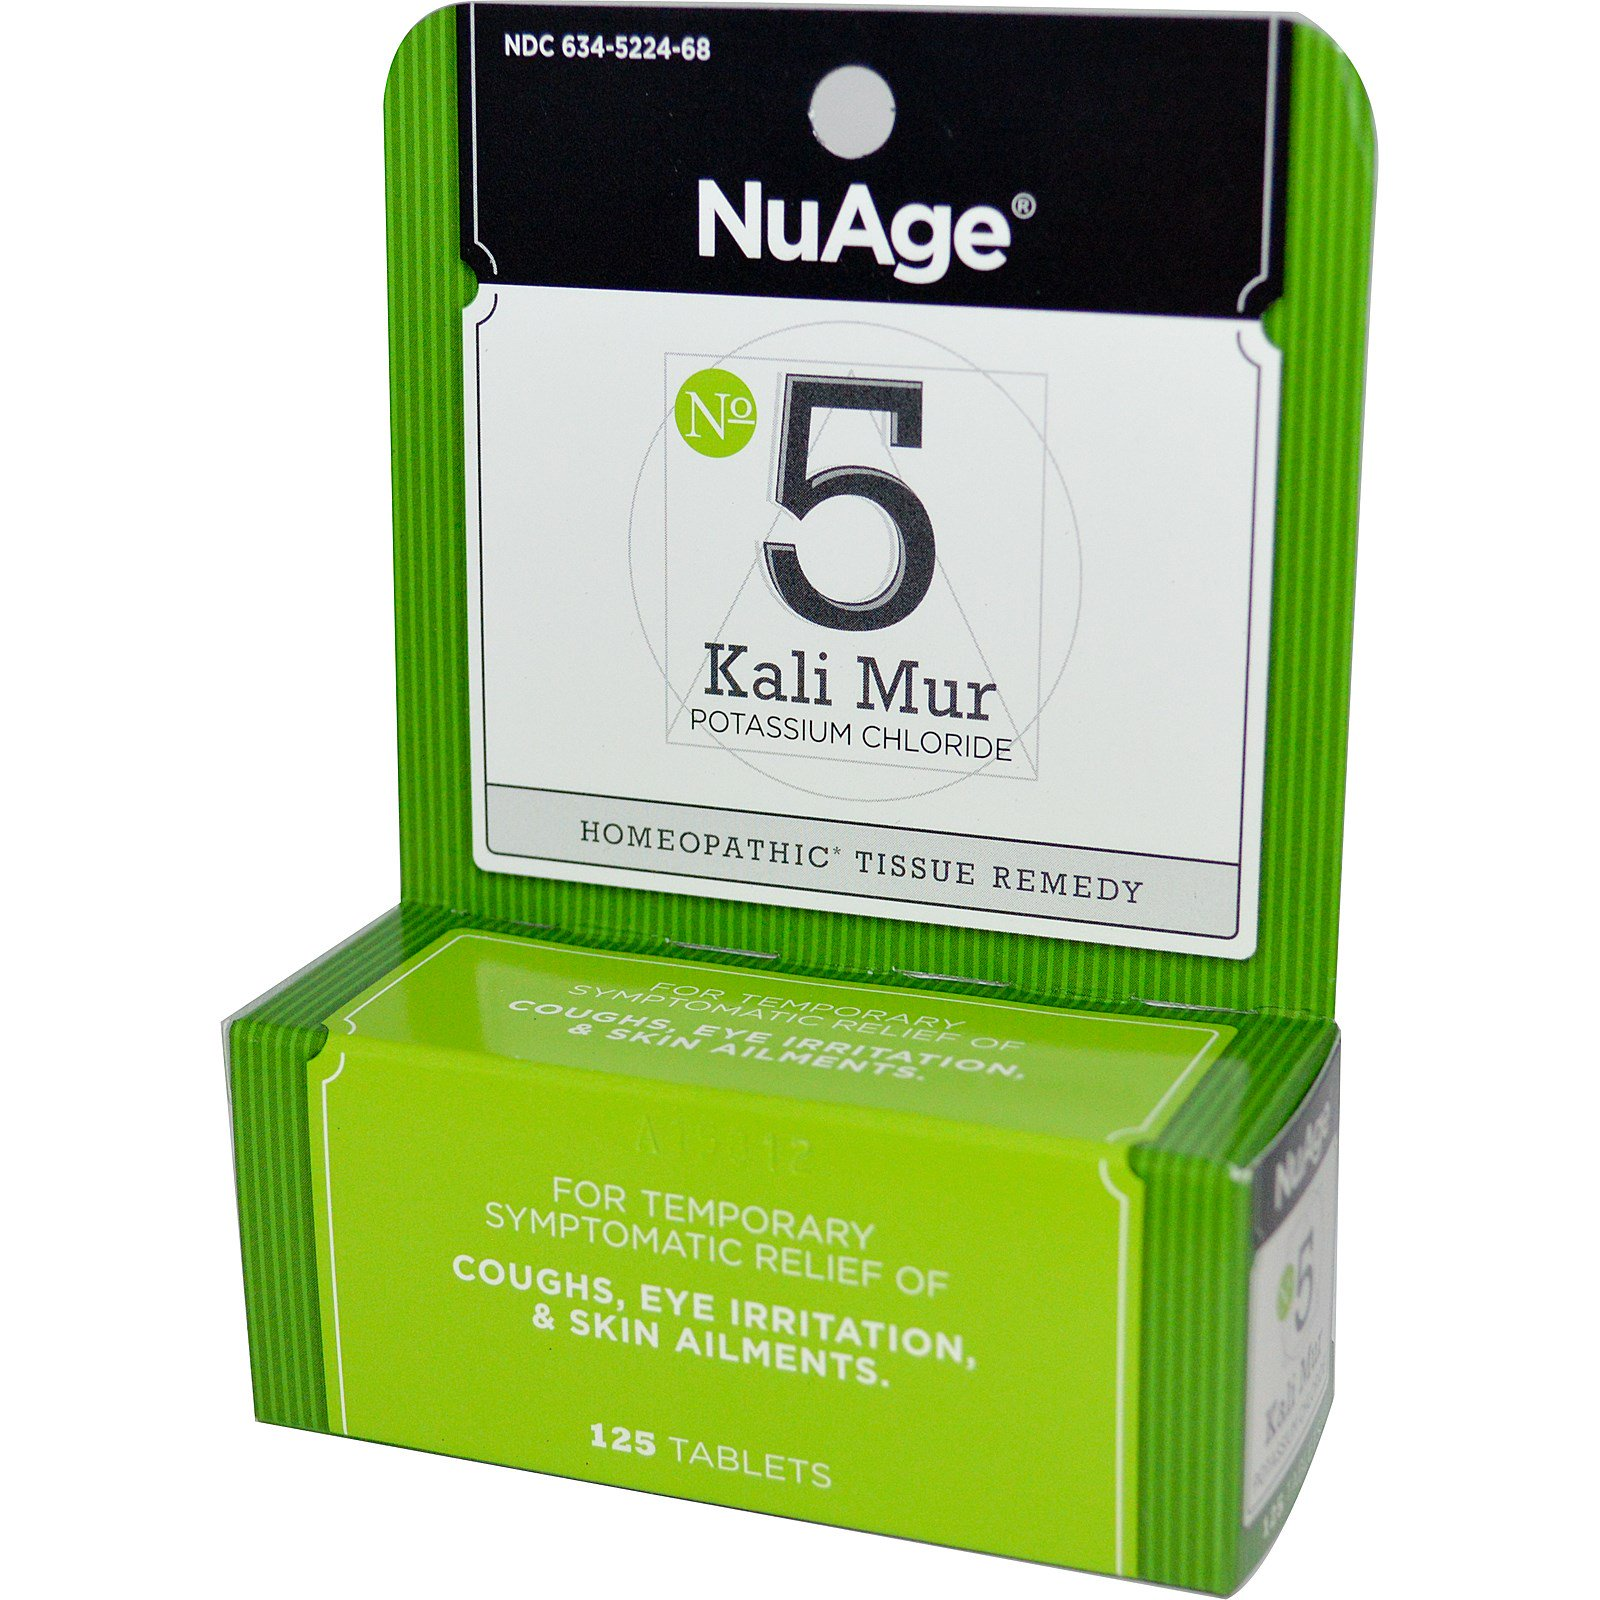 Hyland's, NuAge, No 5 Kali Mur Potassium Chloride, 125 Tablets  (Discontinued Item)